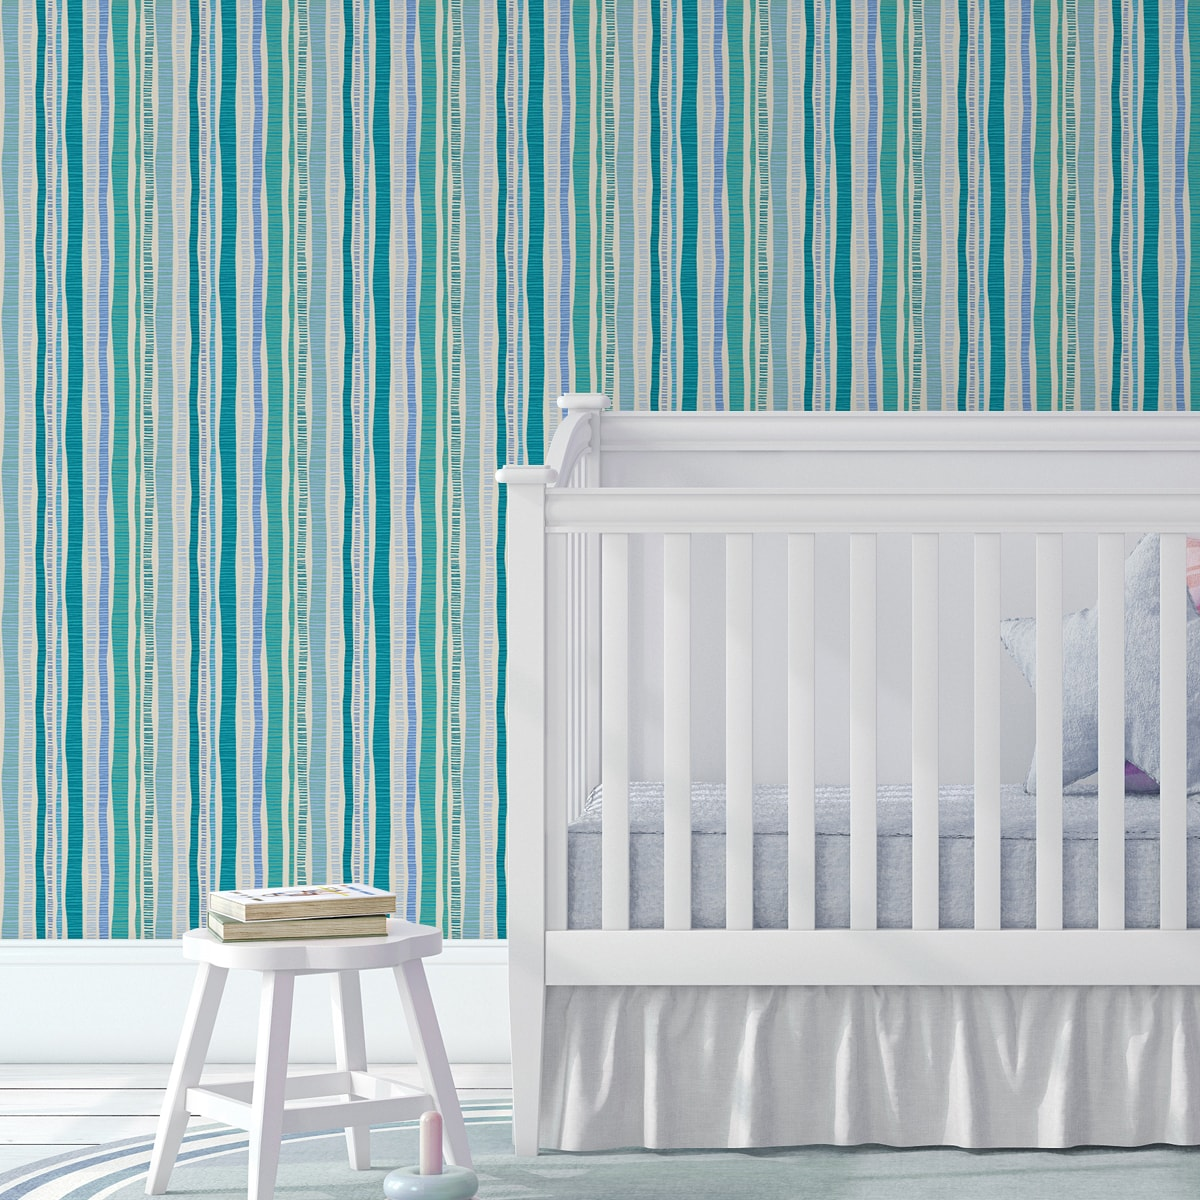 "Kindertapete hellblau: Lustige Streifentapete ""Dotted Lines"" in türkis für Kinderzimmer"